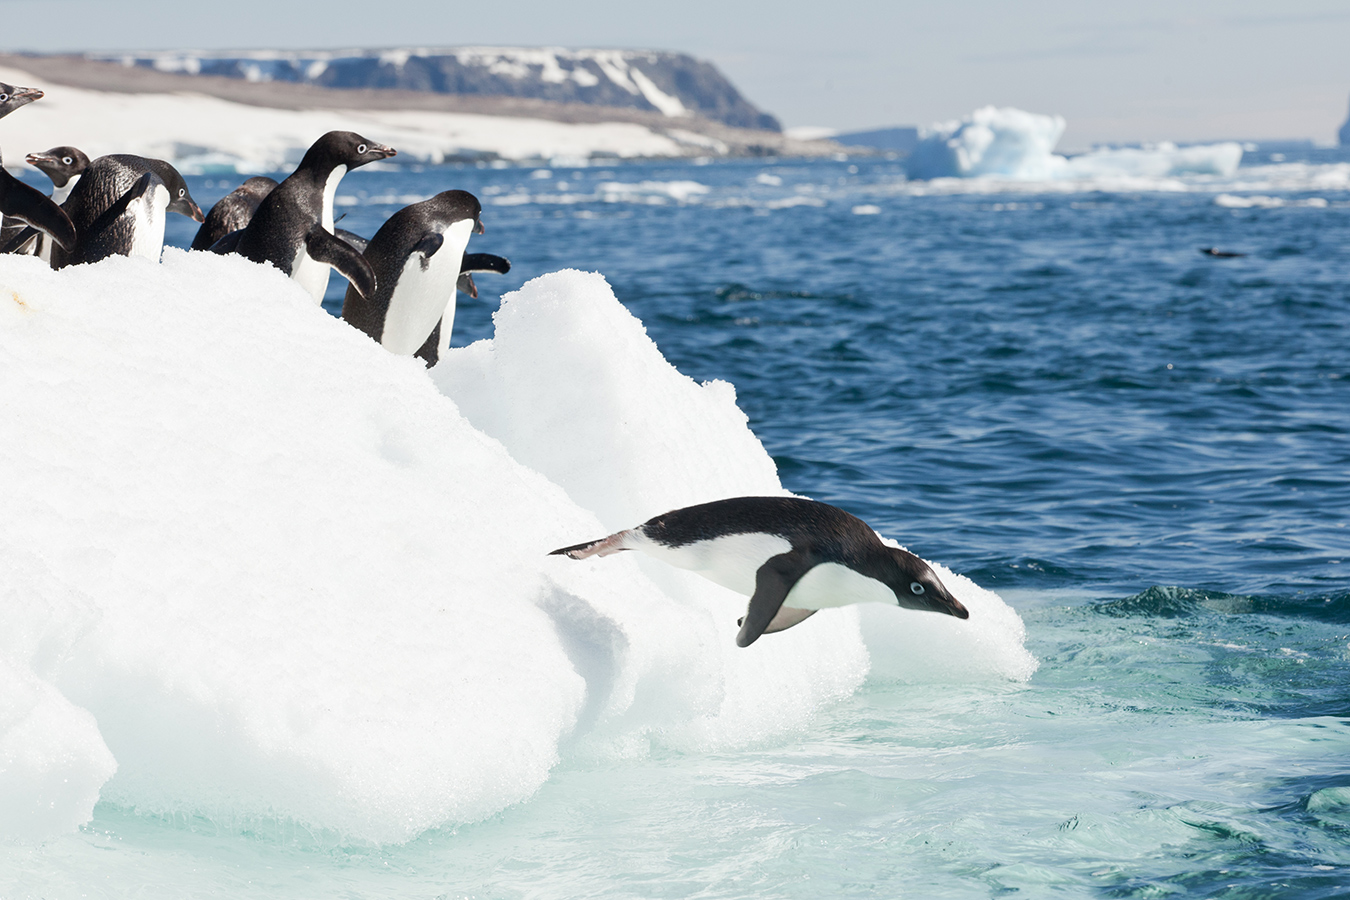 NUVO Web Table of Contents: Quark's Antarctica